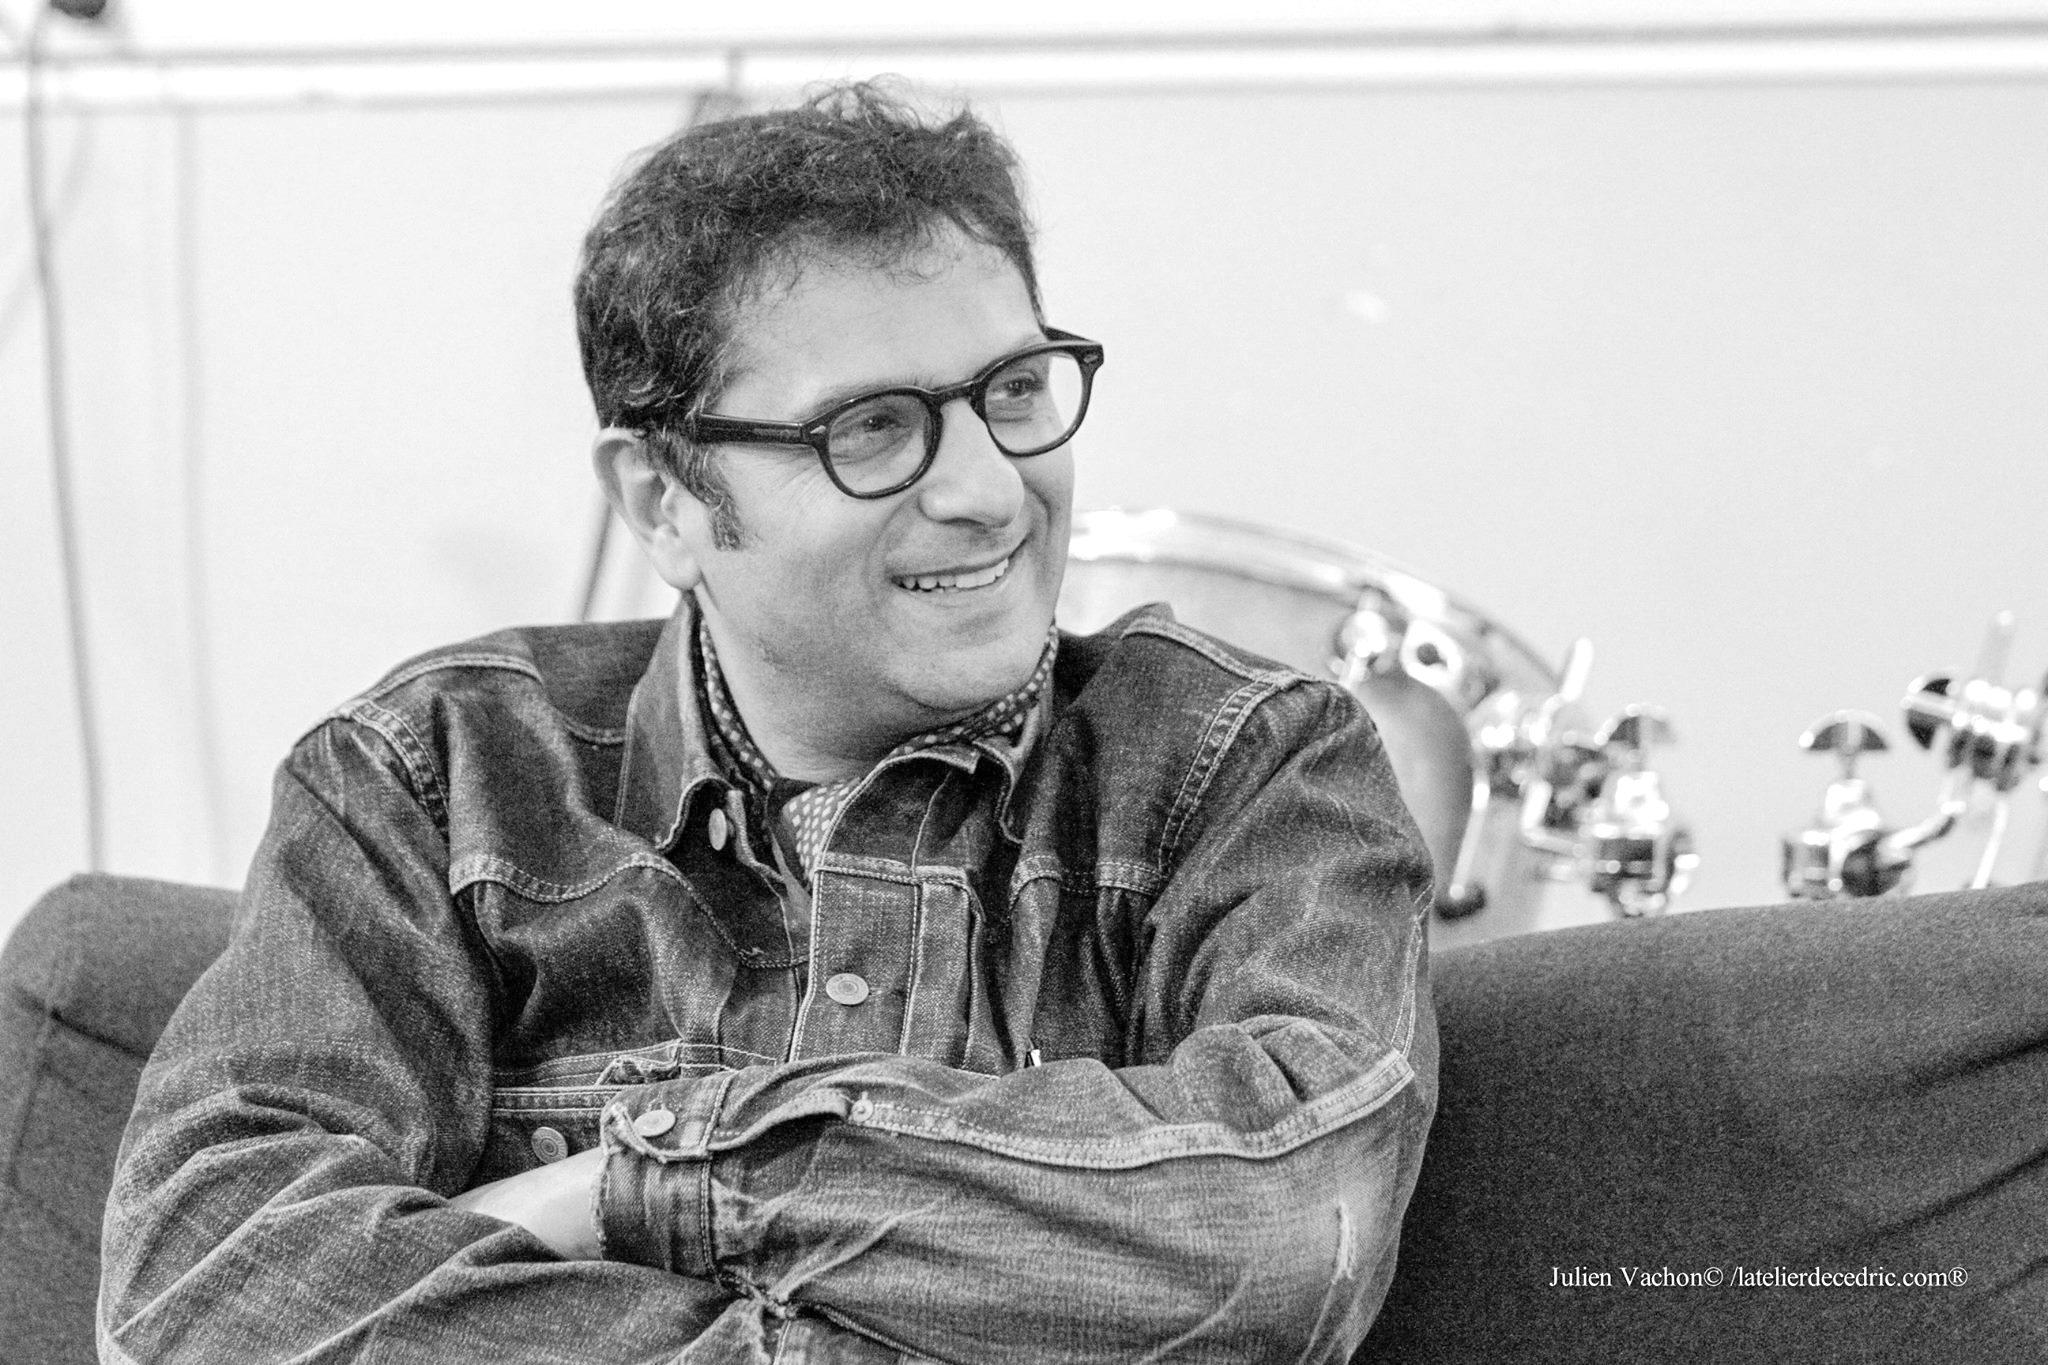 Jean-Claude Ghrenassia